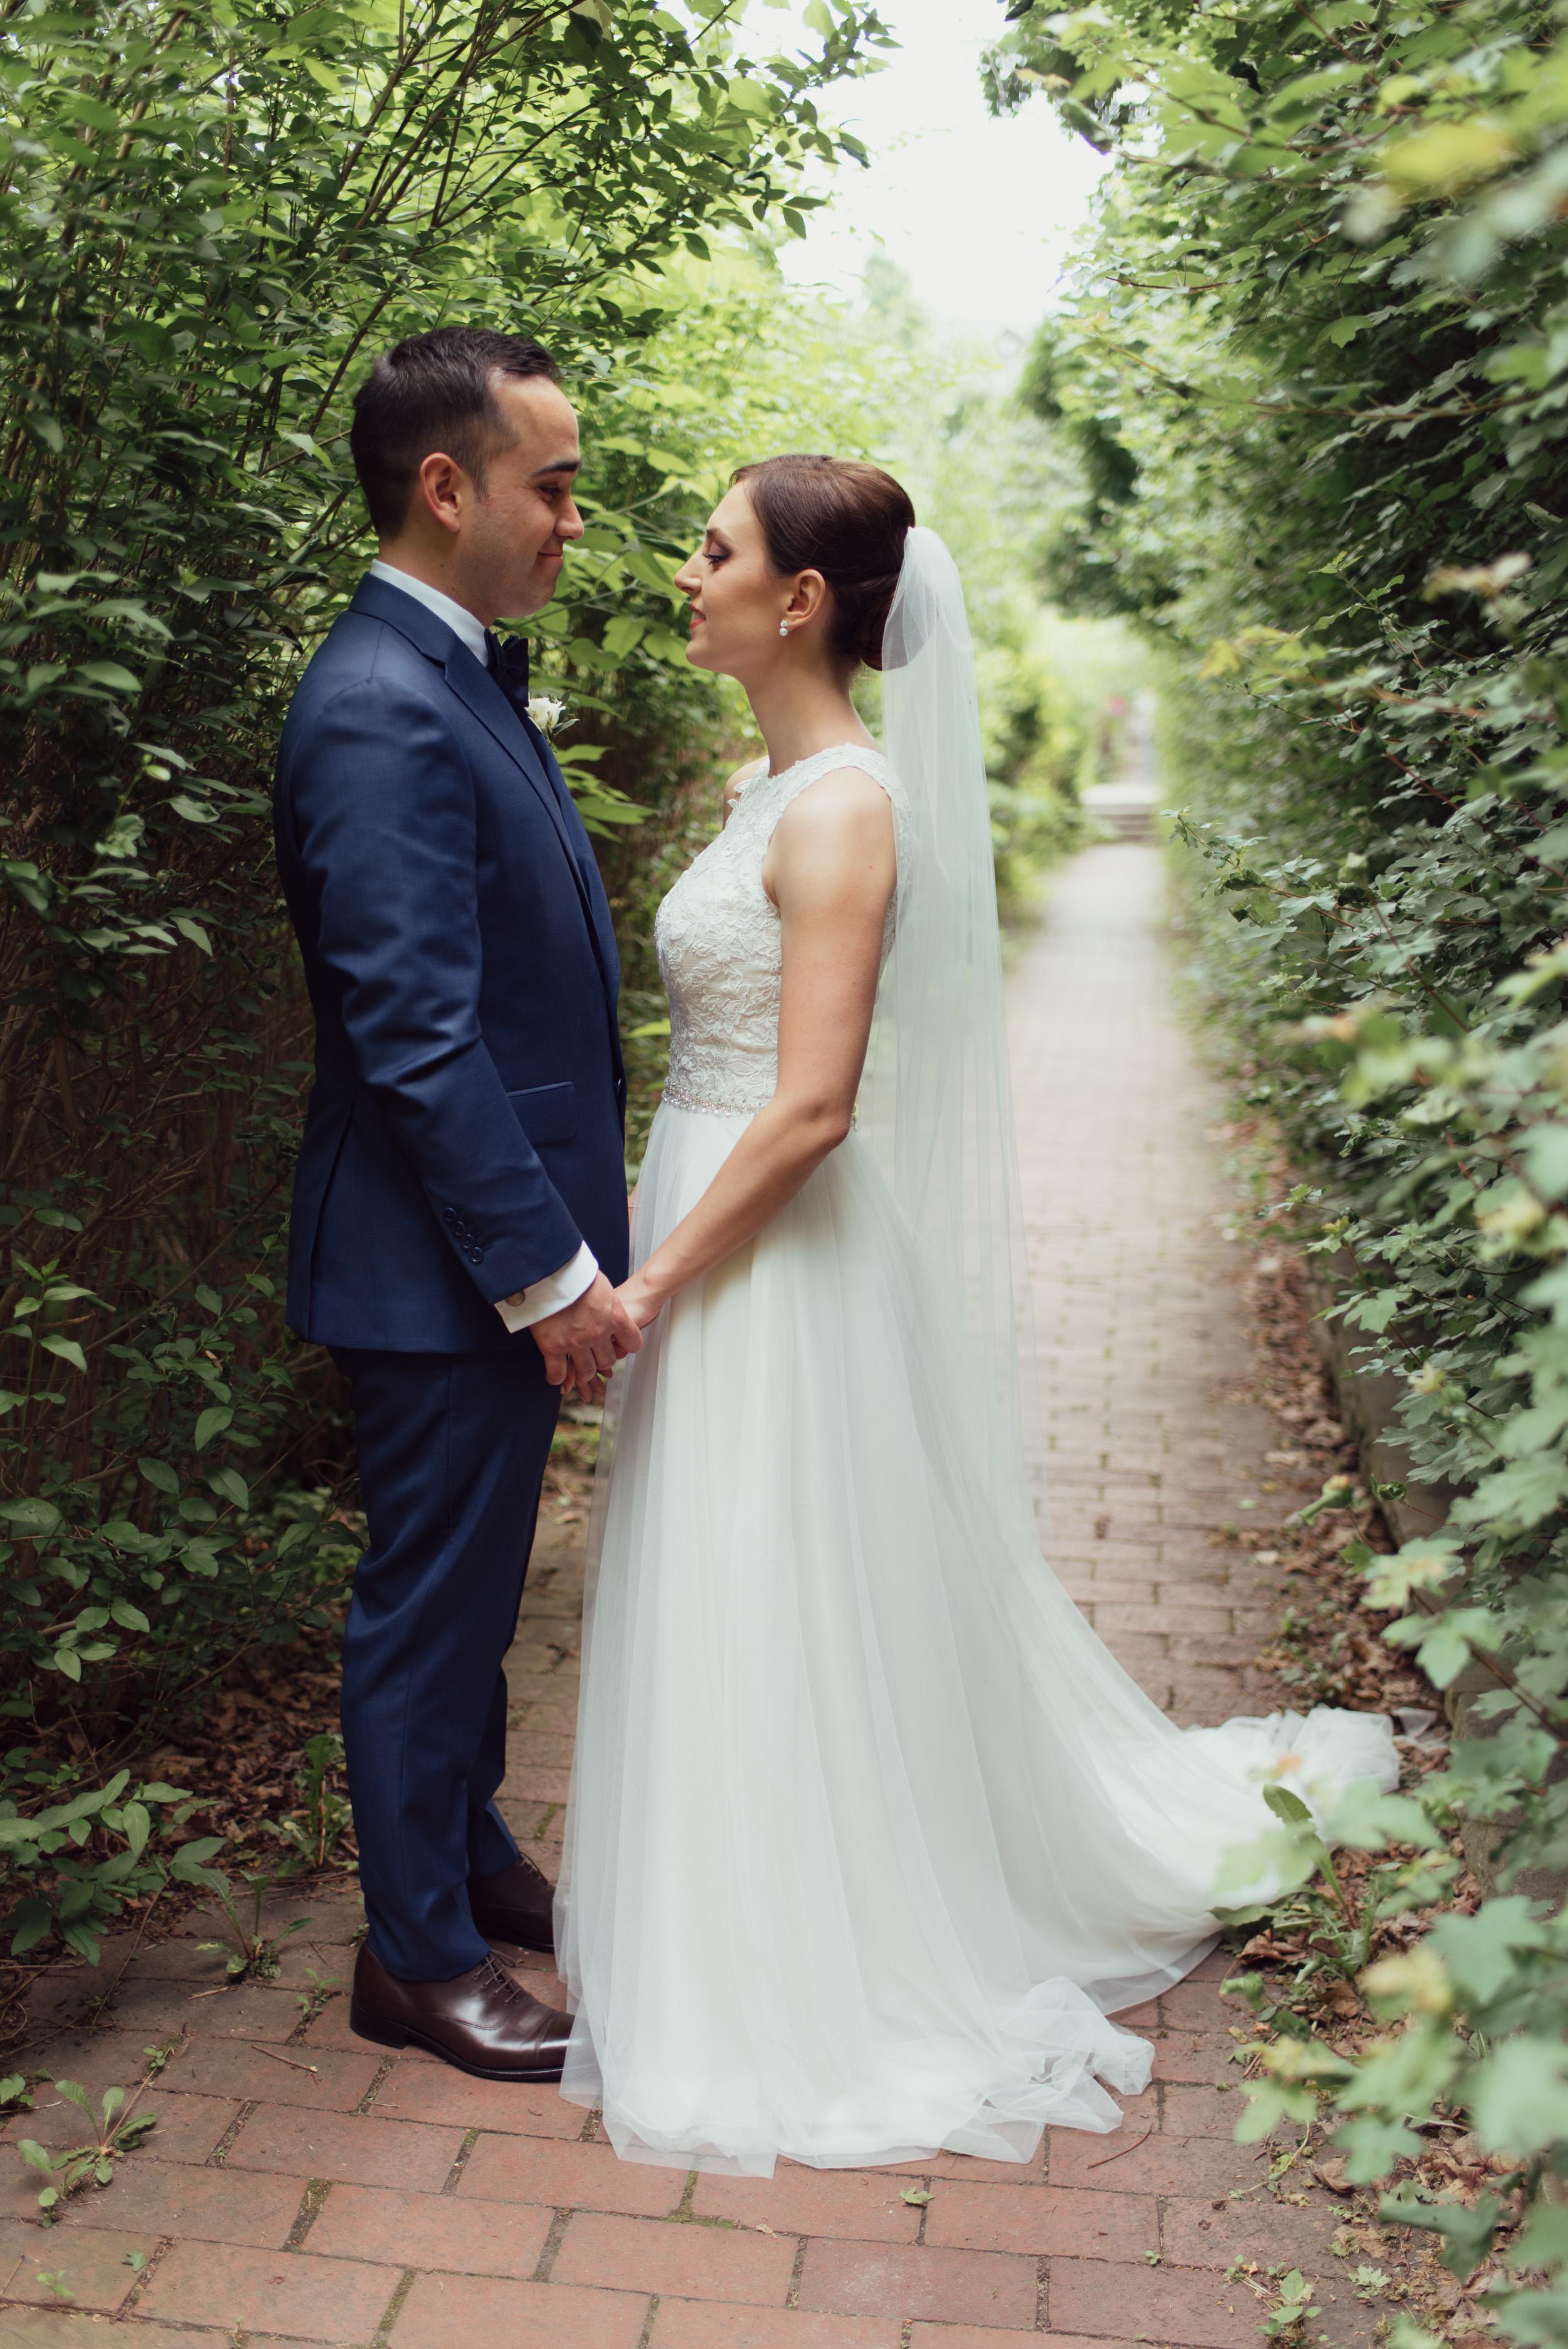 cleland-studios-wedding-photography-22.jpg